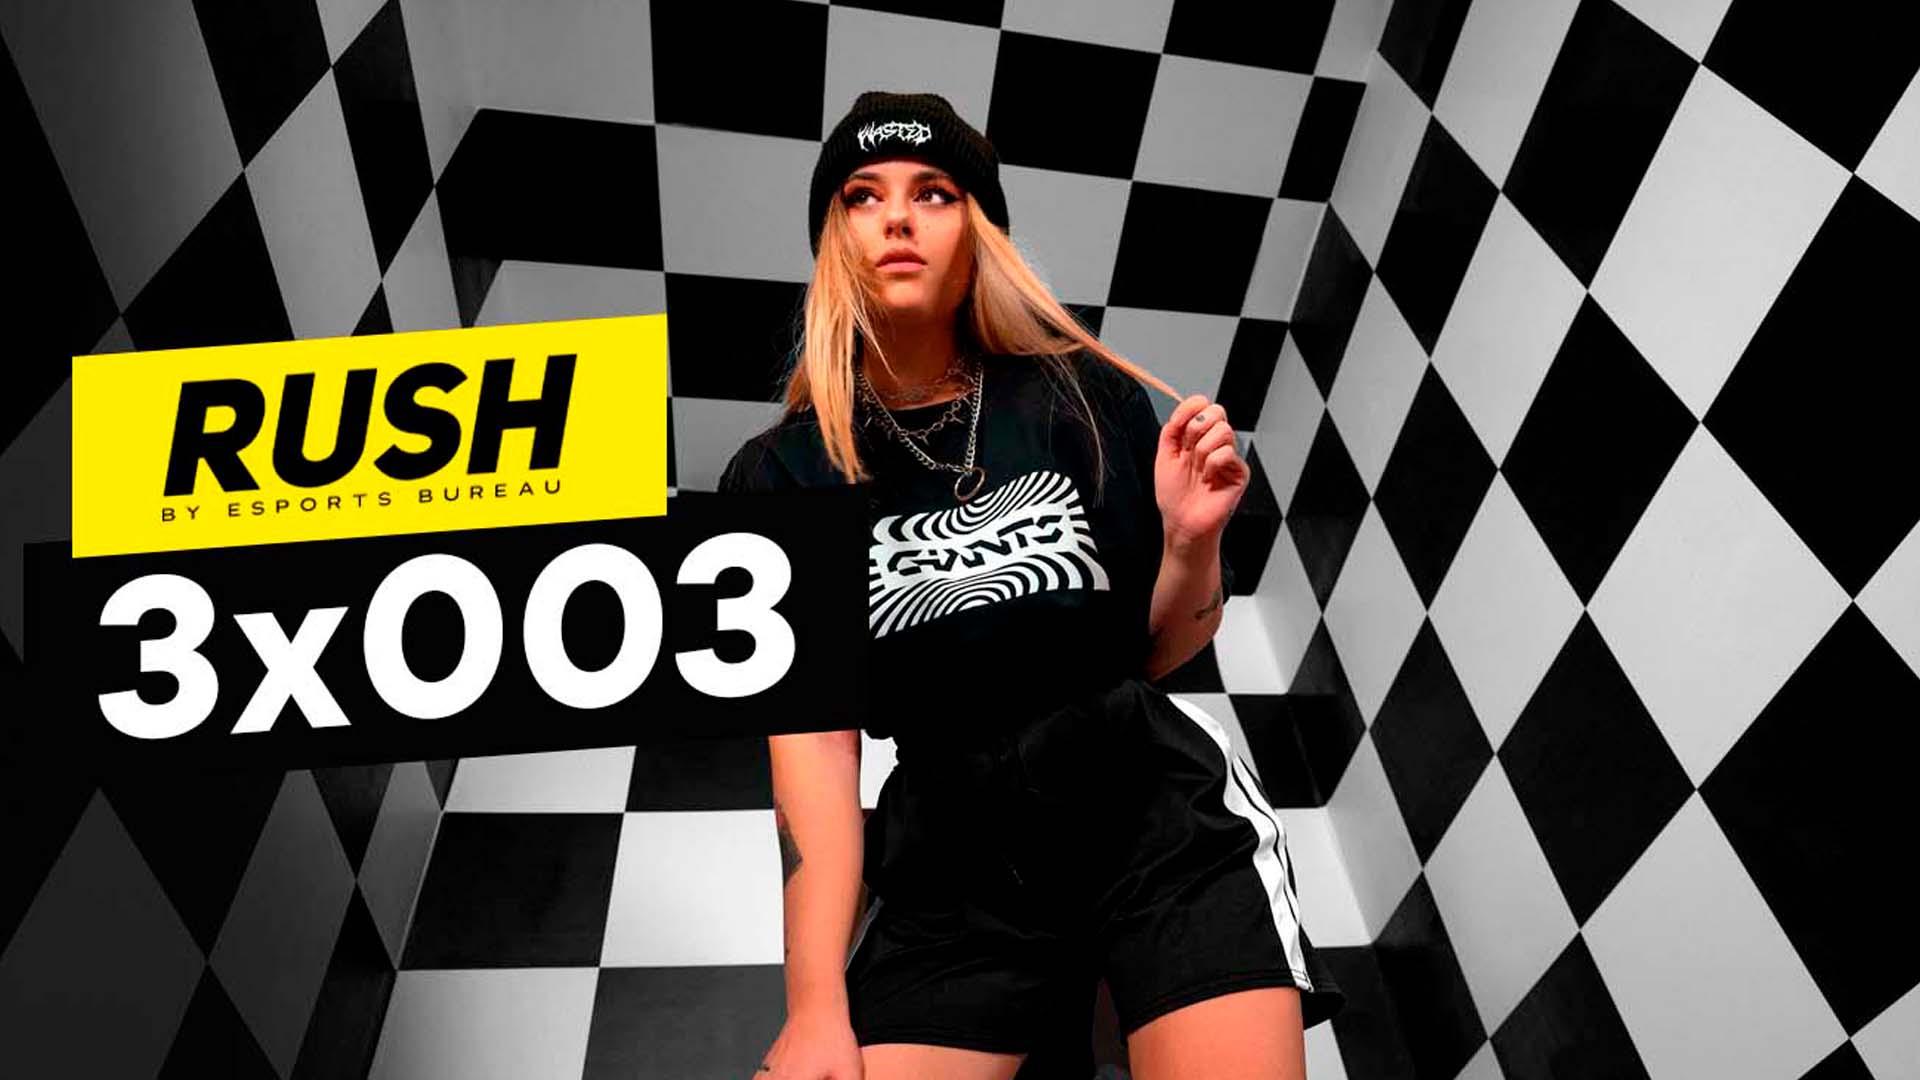 RUSH Temporada 3 Episodio 3